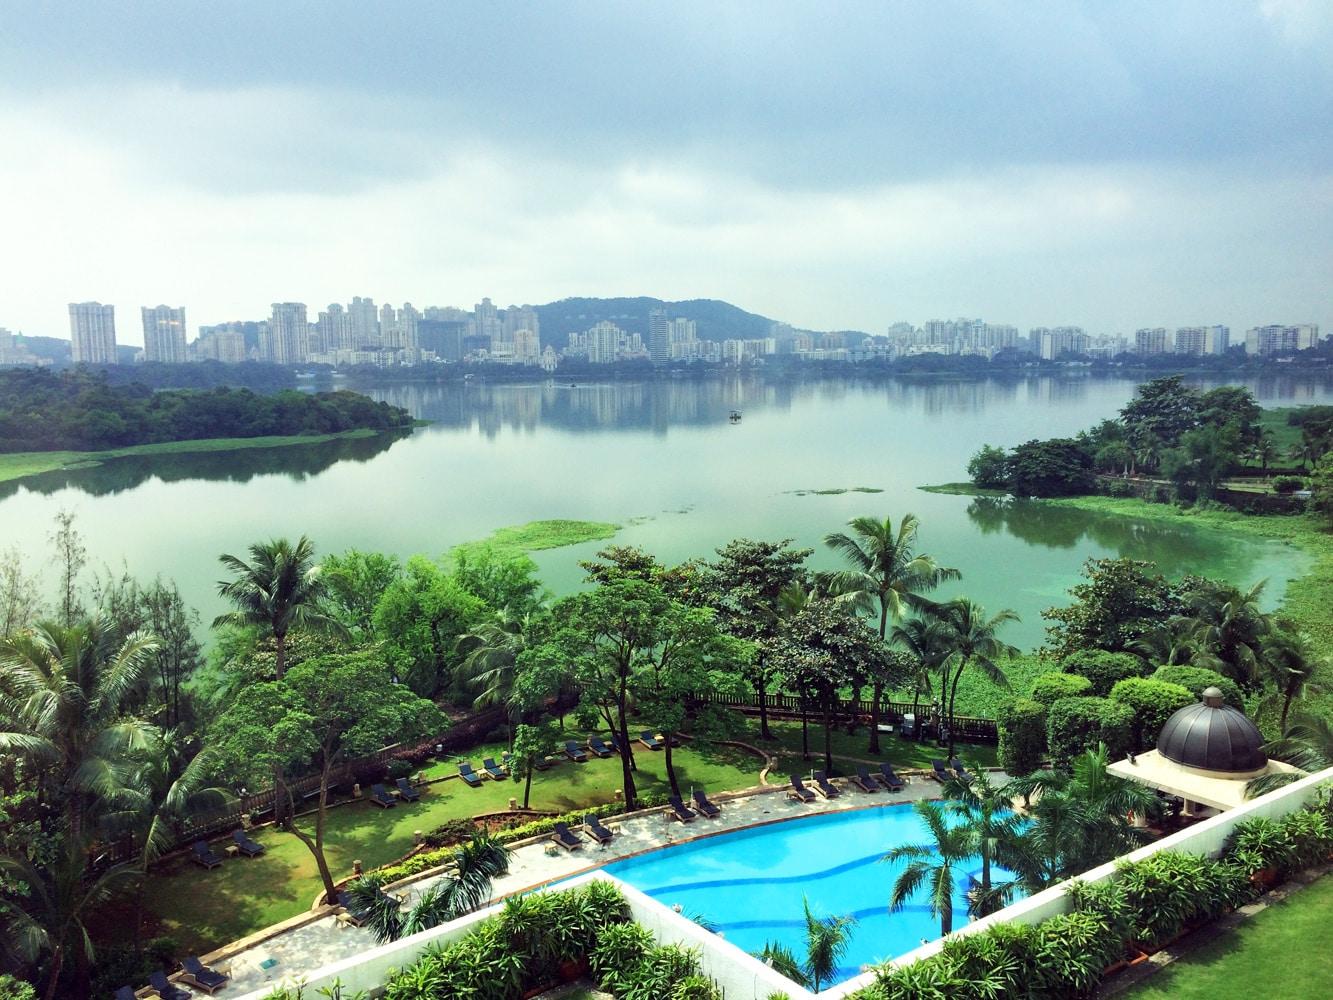 Mumbai Renaissance Hotel Pool und Garten